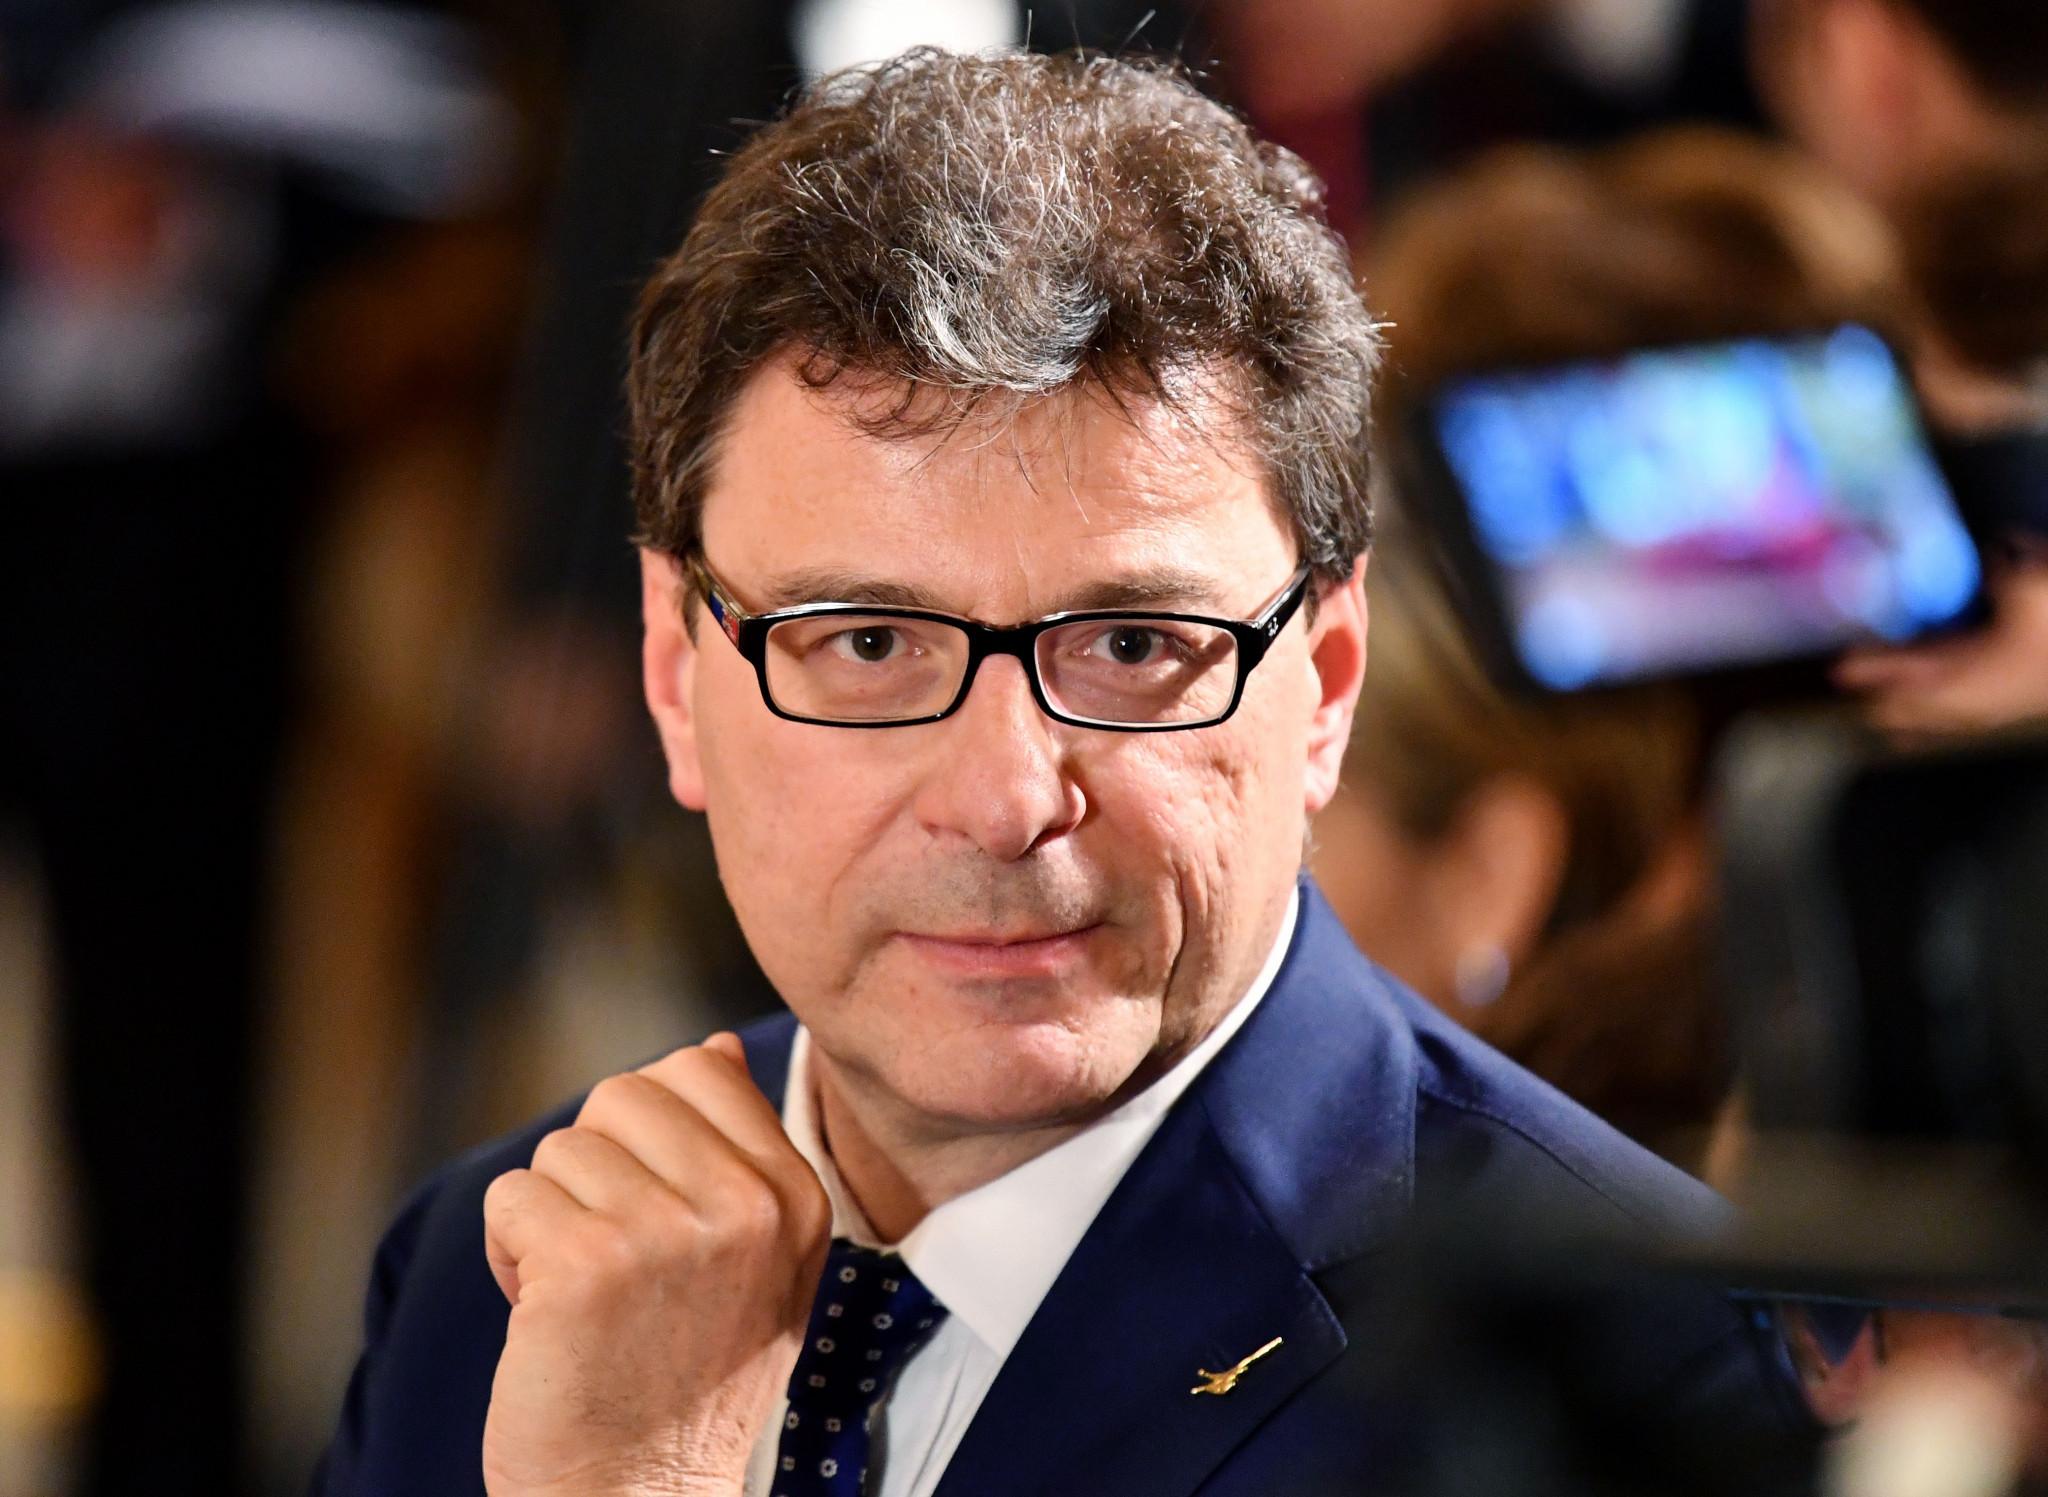 Giancarlo Giorgetti said the three-way bid was dead ©Getty Images